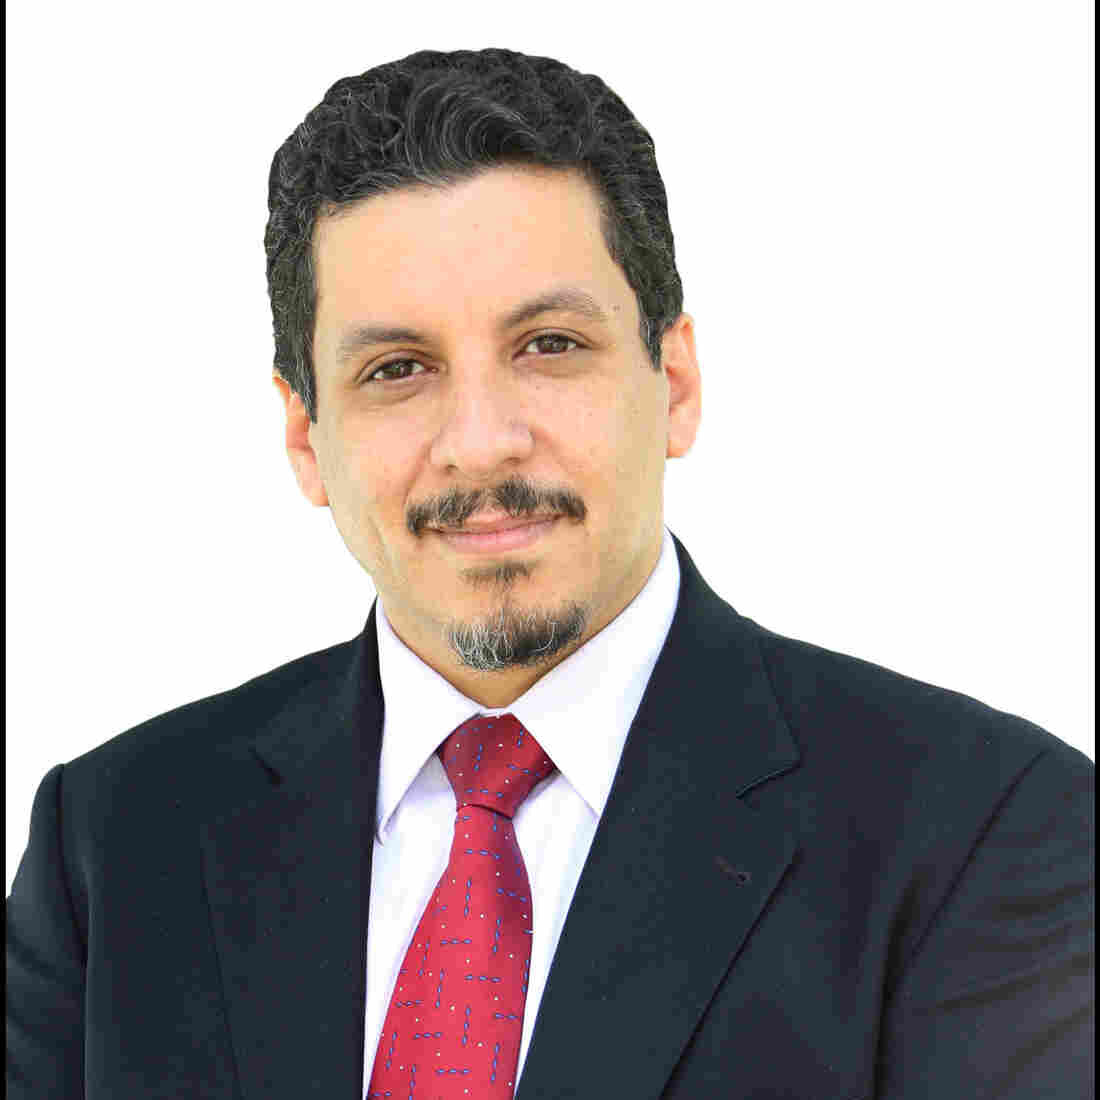 The undated portrait photo shows Ahmed Awad bin Mubarak, chief of staff for Yemeni President Abd-Rabbu Mansour Hadi. Bin Mubarak was kidnapped on Saturday in Sanaa.